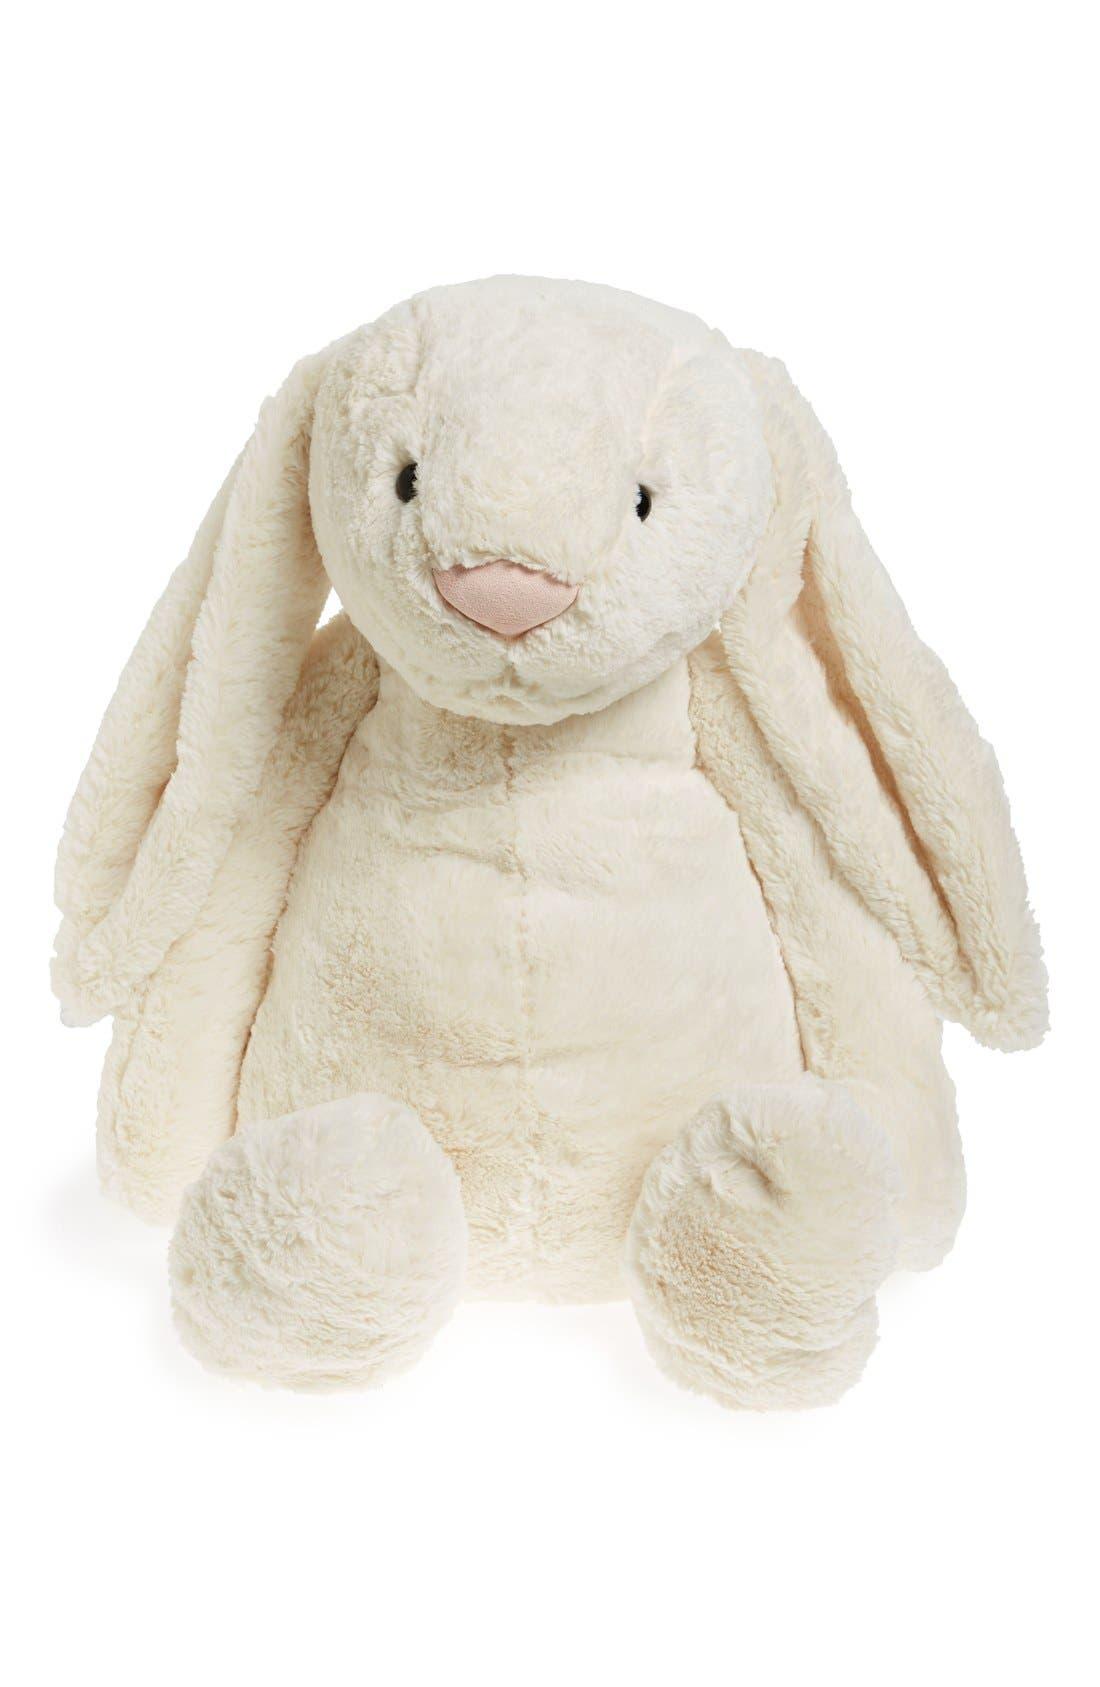 Main Image - Jellycat 'Really Big Bashful Bunny' Stuffed Animal